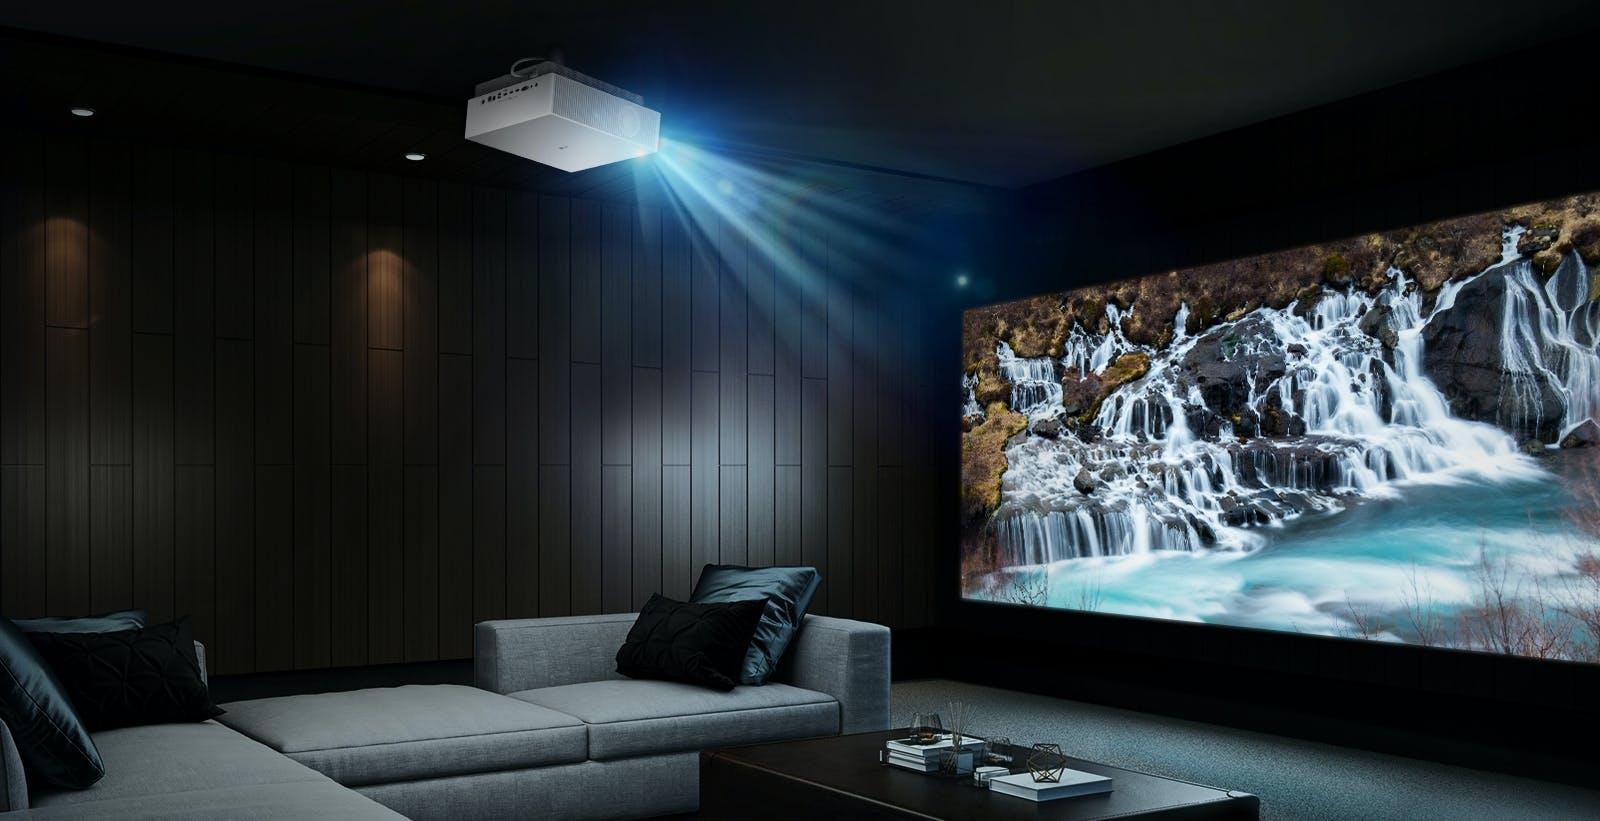 LG annuncia CineBeam 4K, videoproiettore LASER con WebOS e AirPlay 2